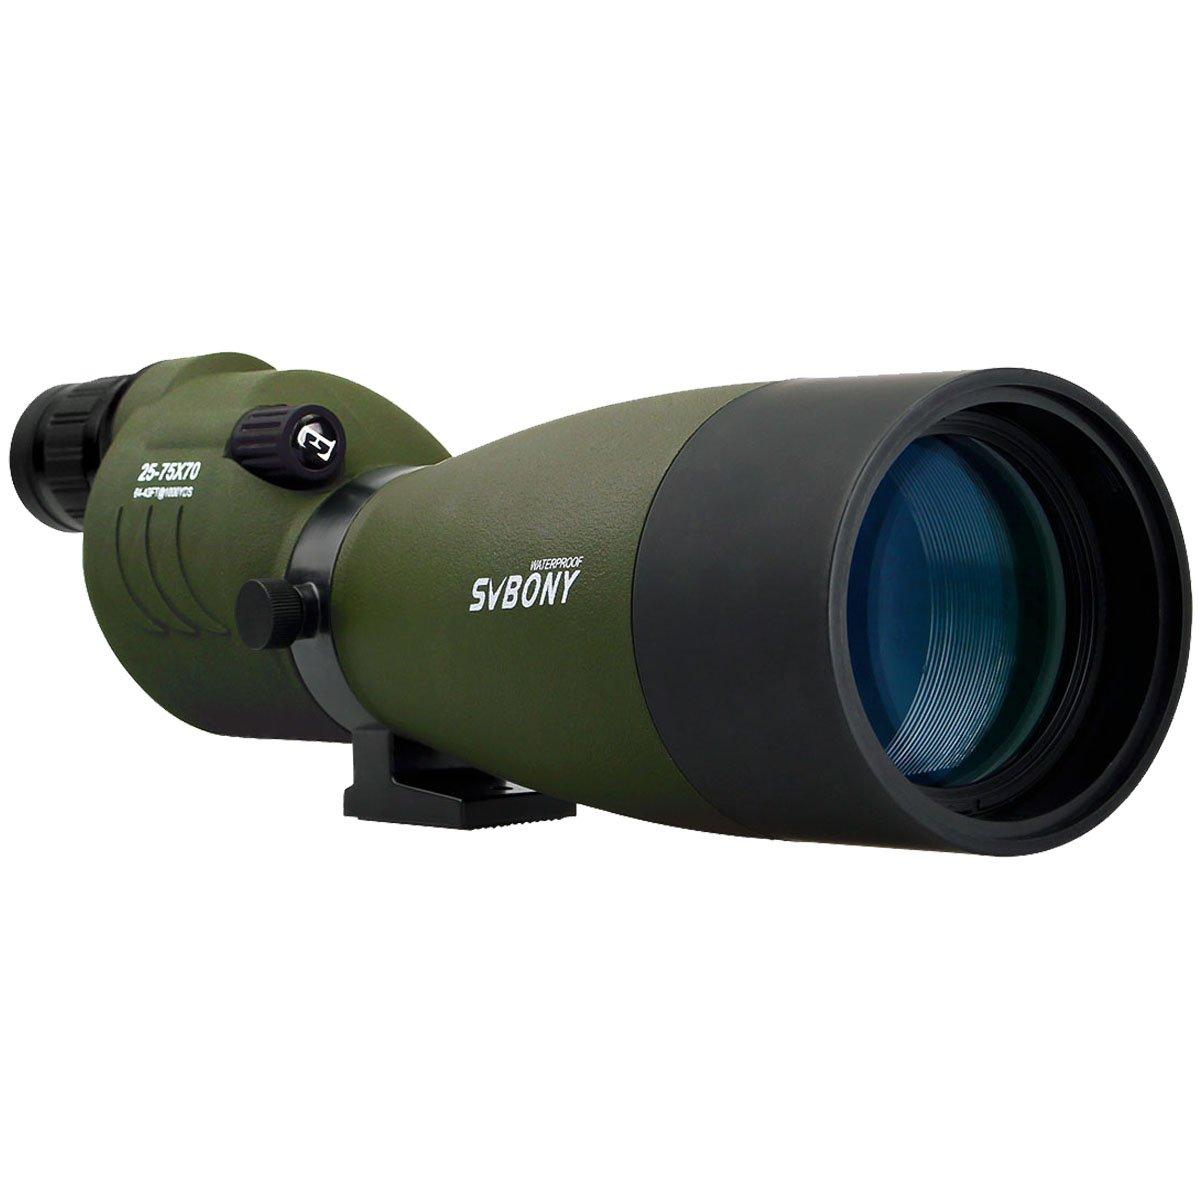 SVBONY SV17 Spotting Scope 25-75x70mm Zoom Telescope Bak4 Waterproof Straight Scope for Bird Watching Target Shooting Archery Range with Soft Carry Case